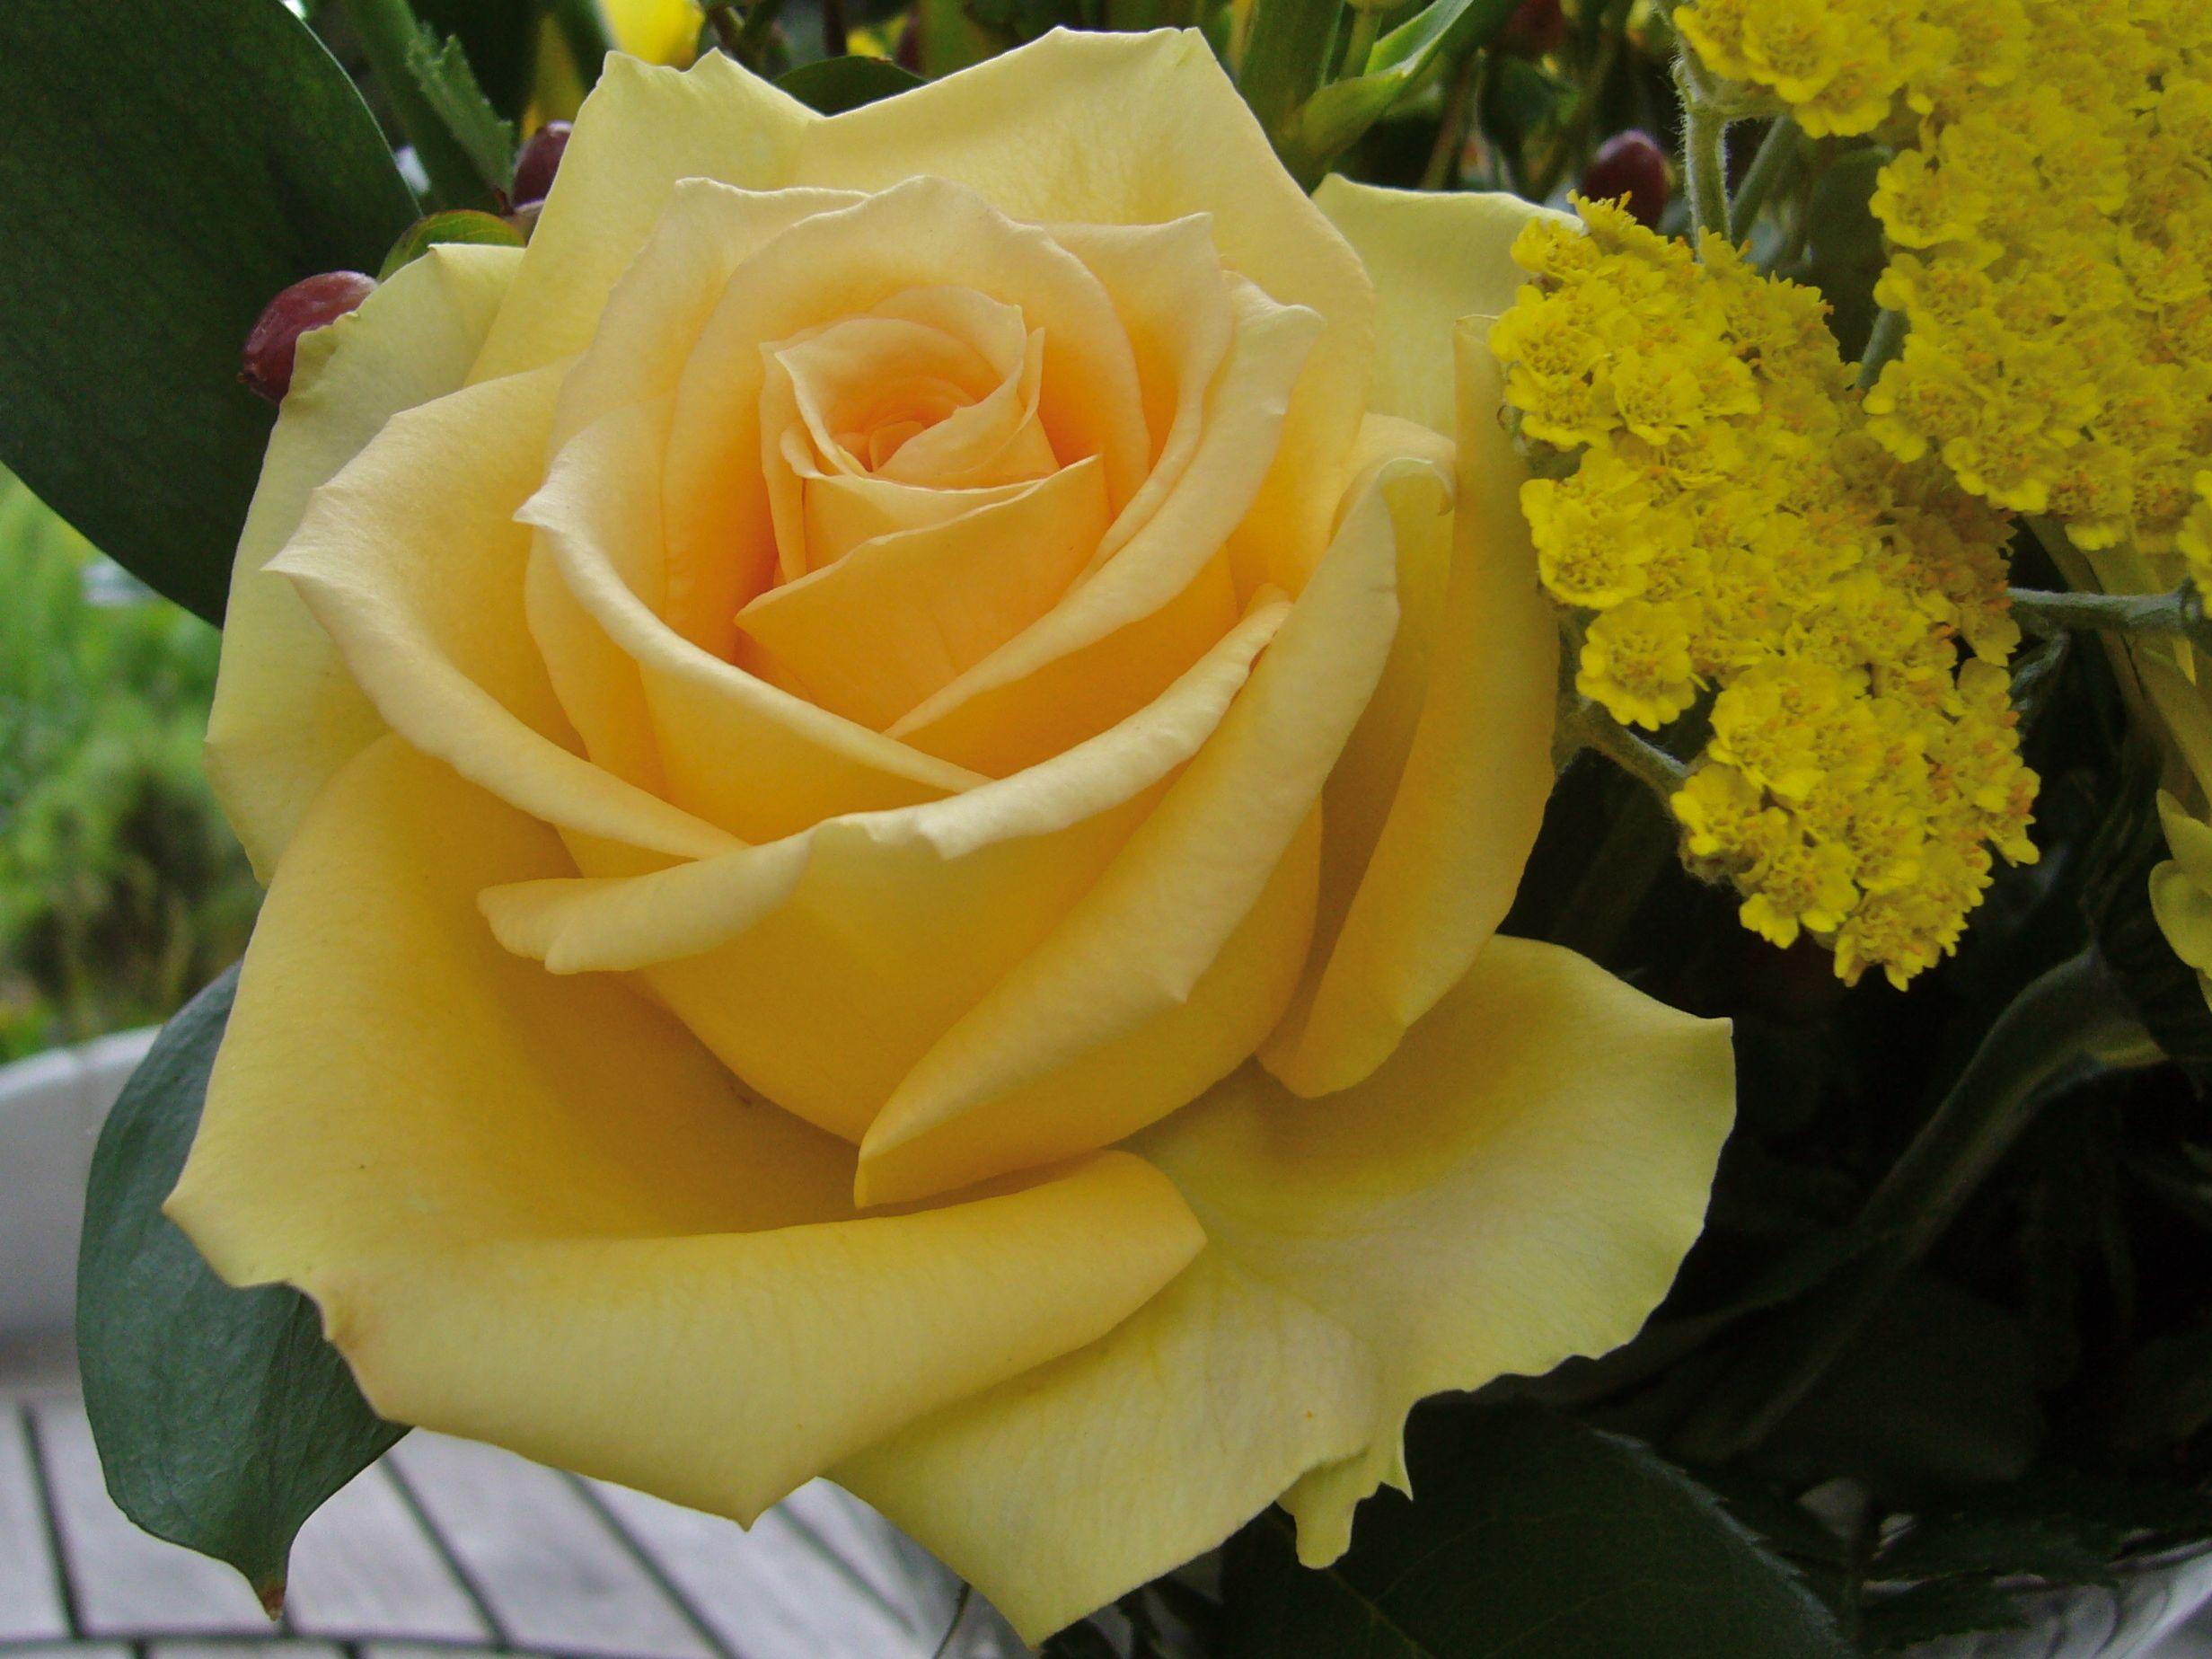 Rose blooming in zaffelare belgium in july photo wvc rosen